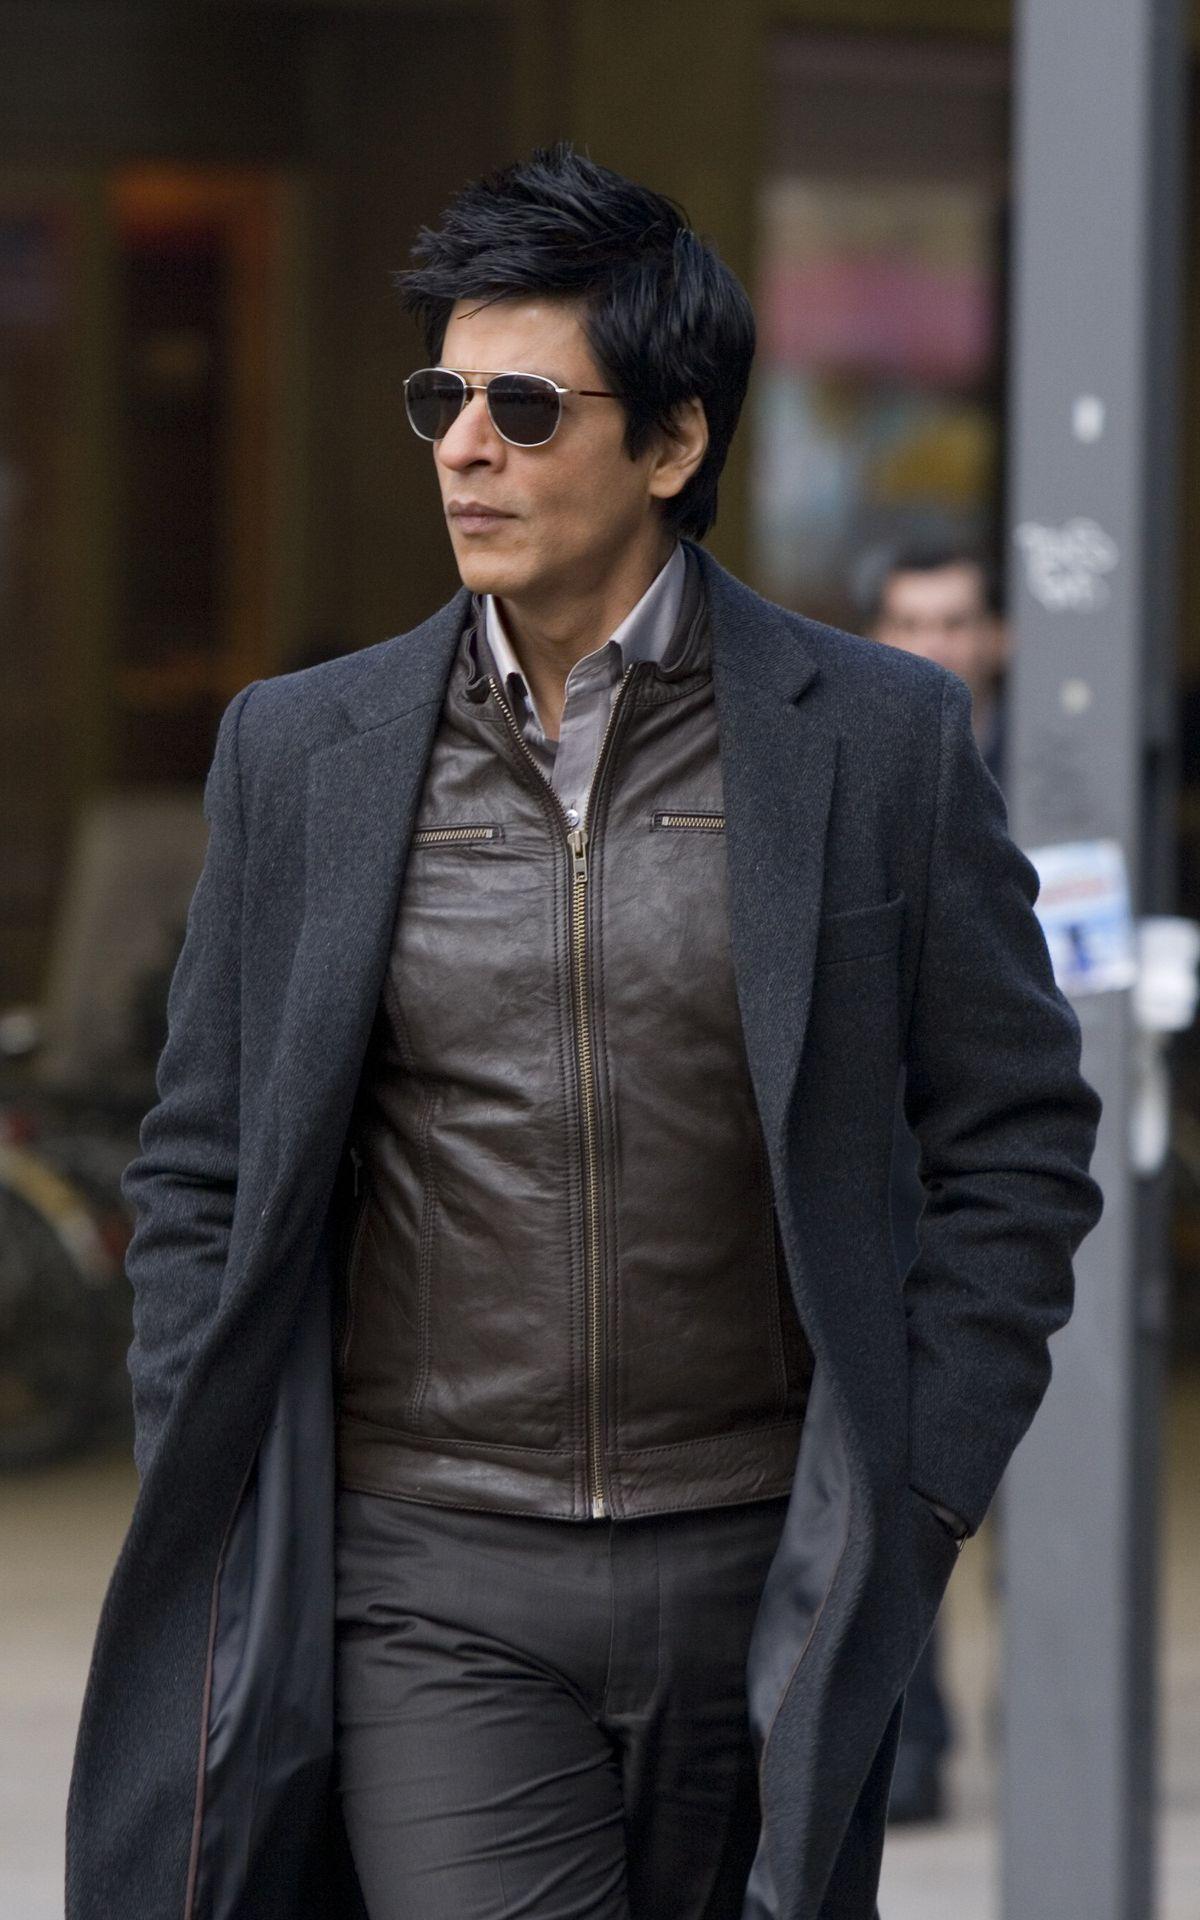 10+ Best Srk hair style images  shahrukh khan, khan, bollywood